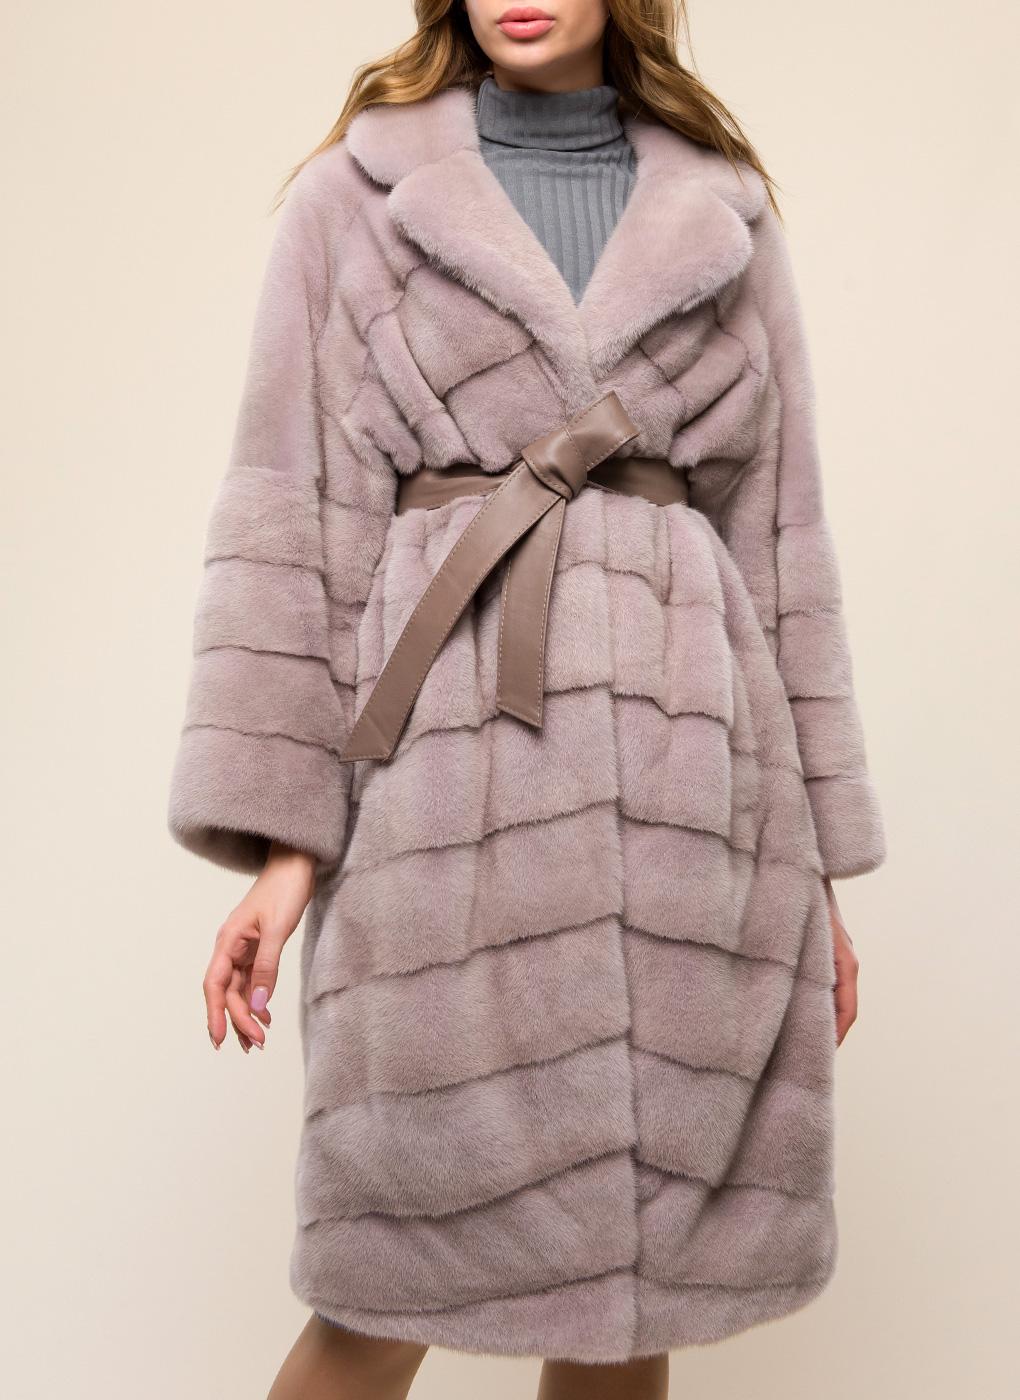 Норковая шуба Гелена 01, Soulis furs фото